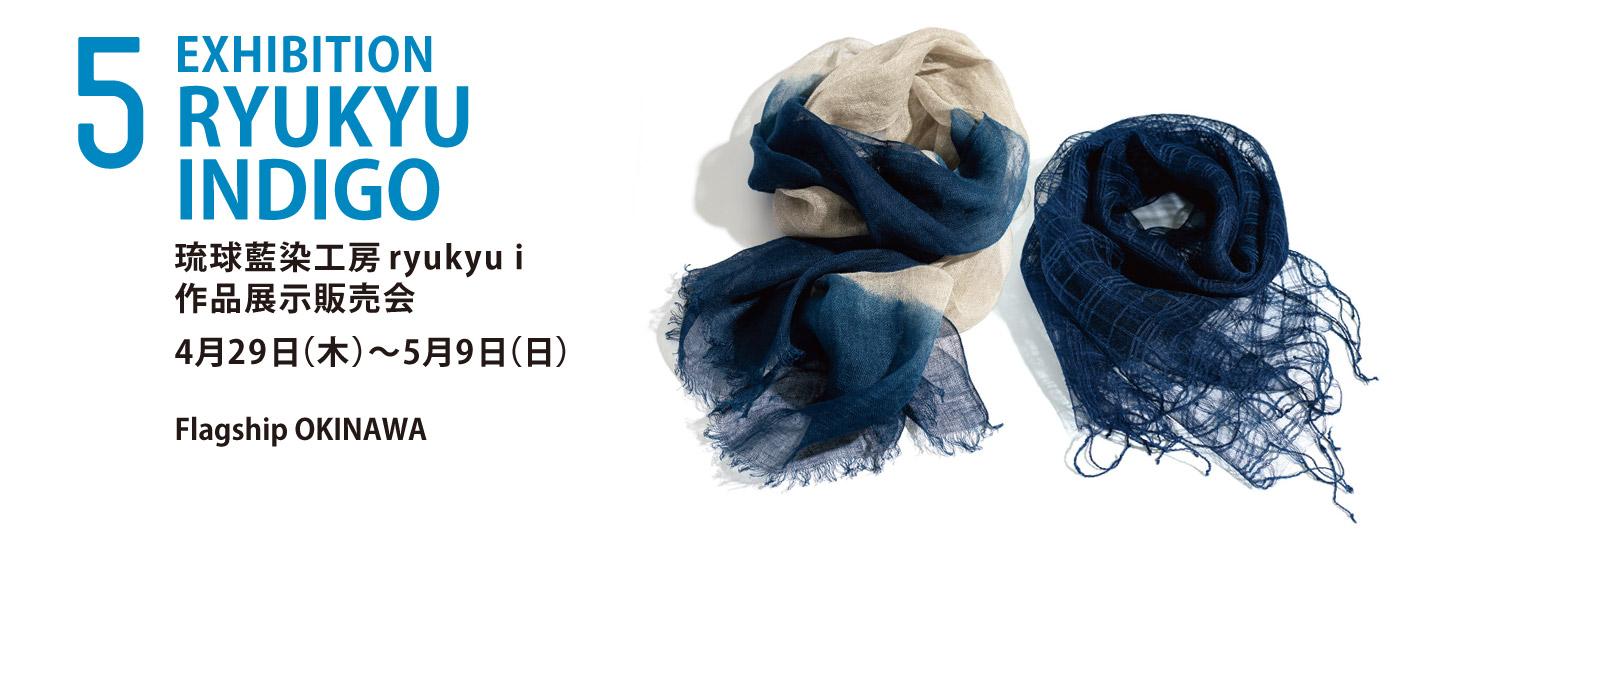 RYUKYU INDIGO EXHIBITION 琉球藍染工房 「ryukyu i 」作品展示販売会<br /> 4月29日(木)〜5月9日(日)